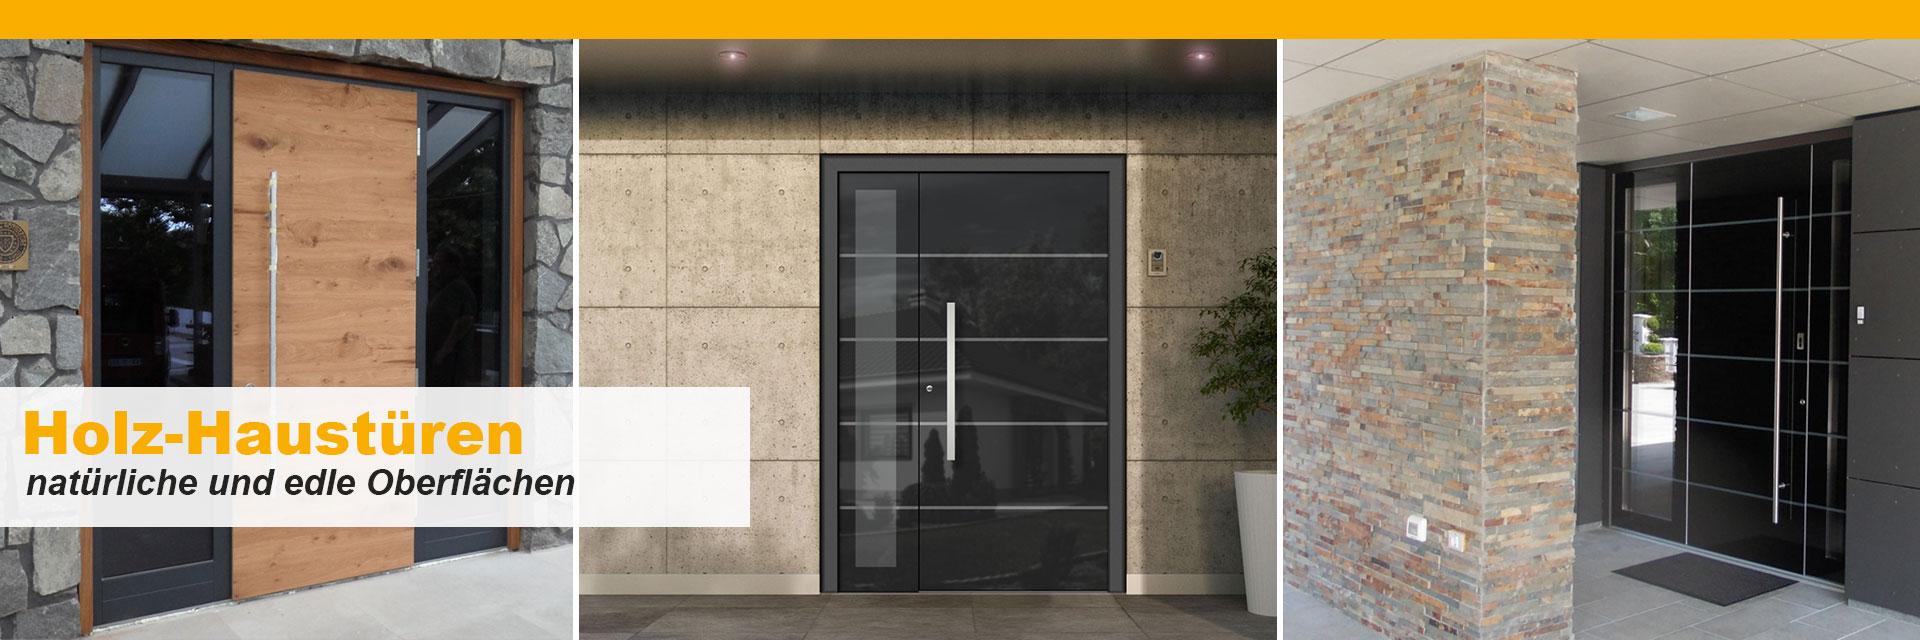 elegante holz haust ren mit schwarzem vetro glas vom. Black Bedroom Furniture Sets. Home Design Ideas